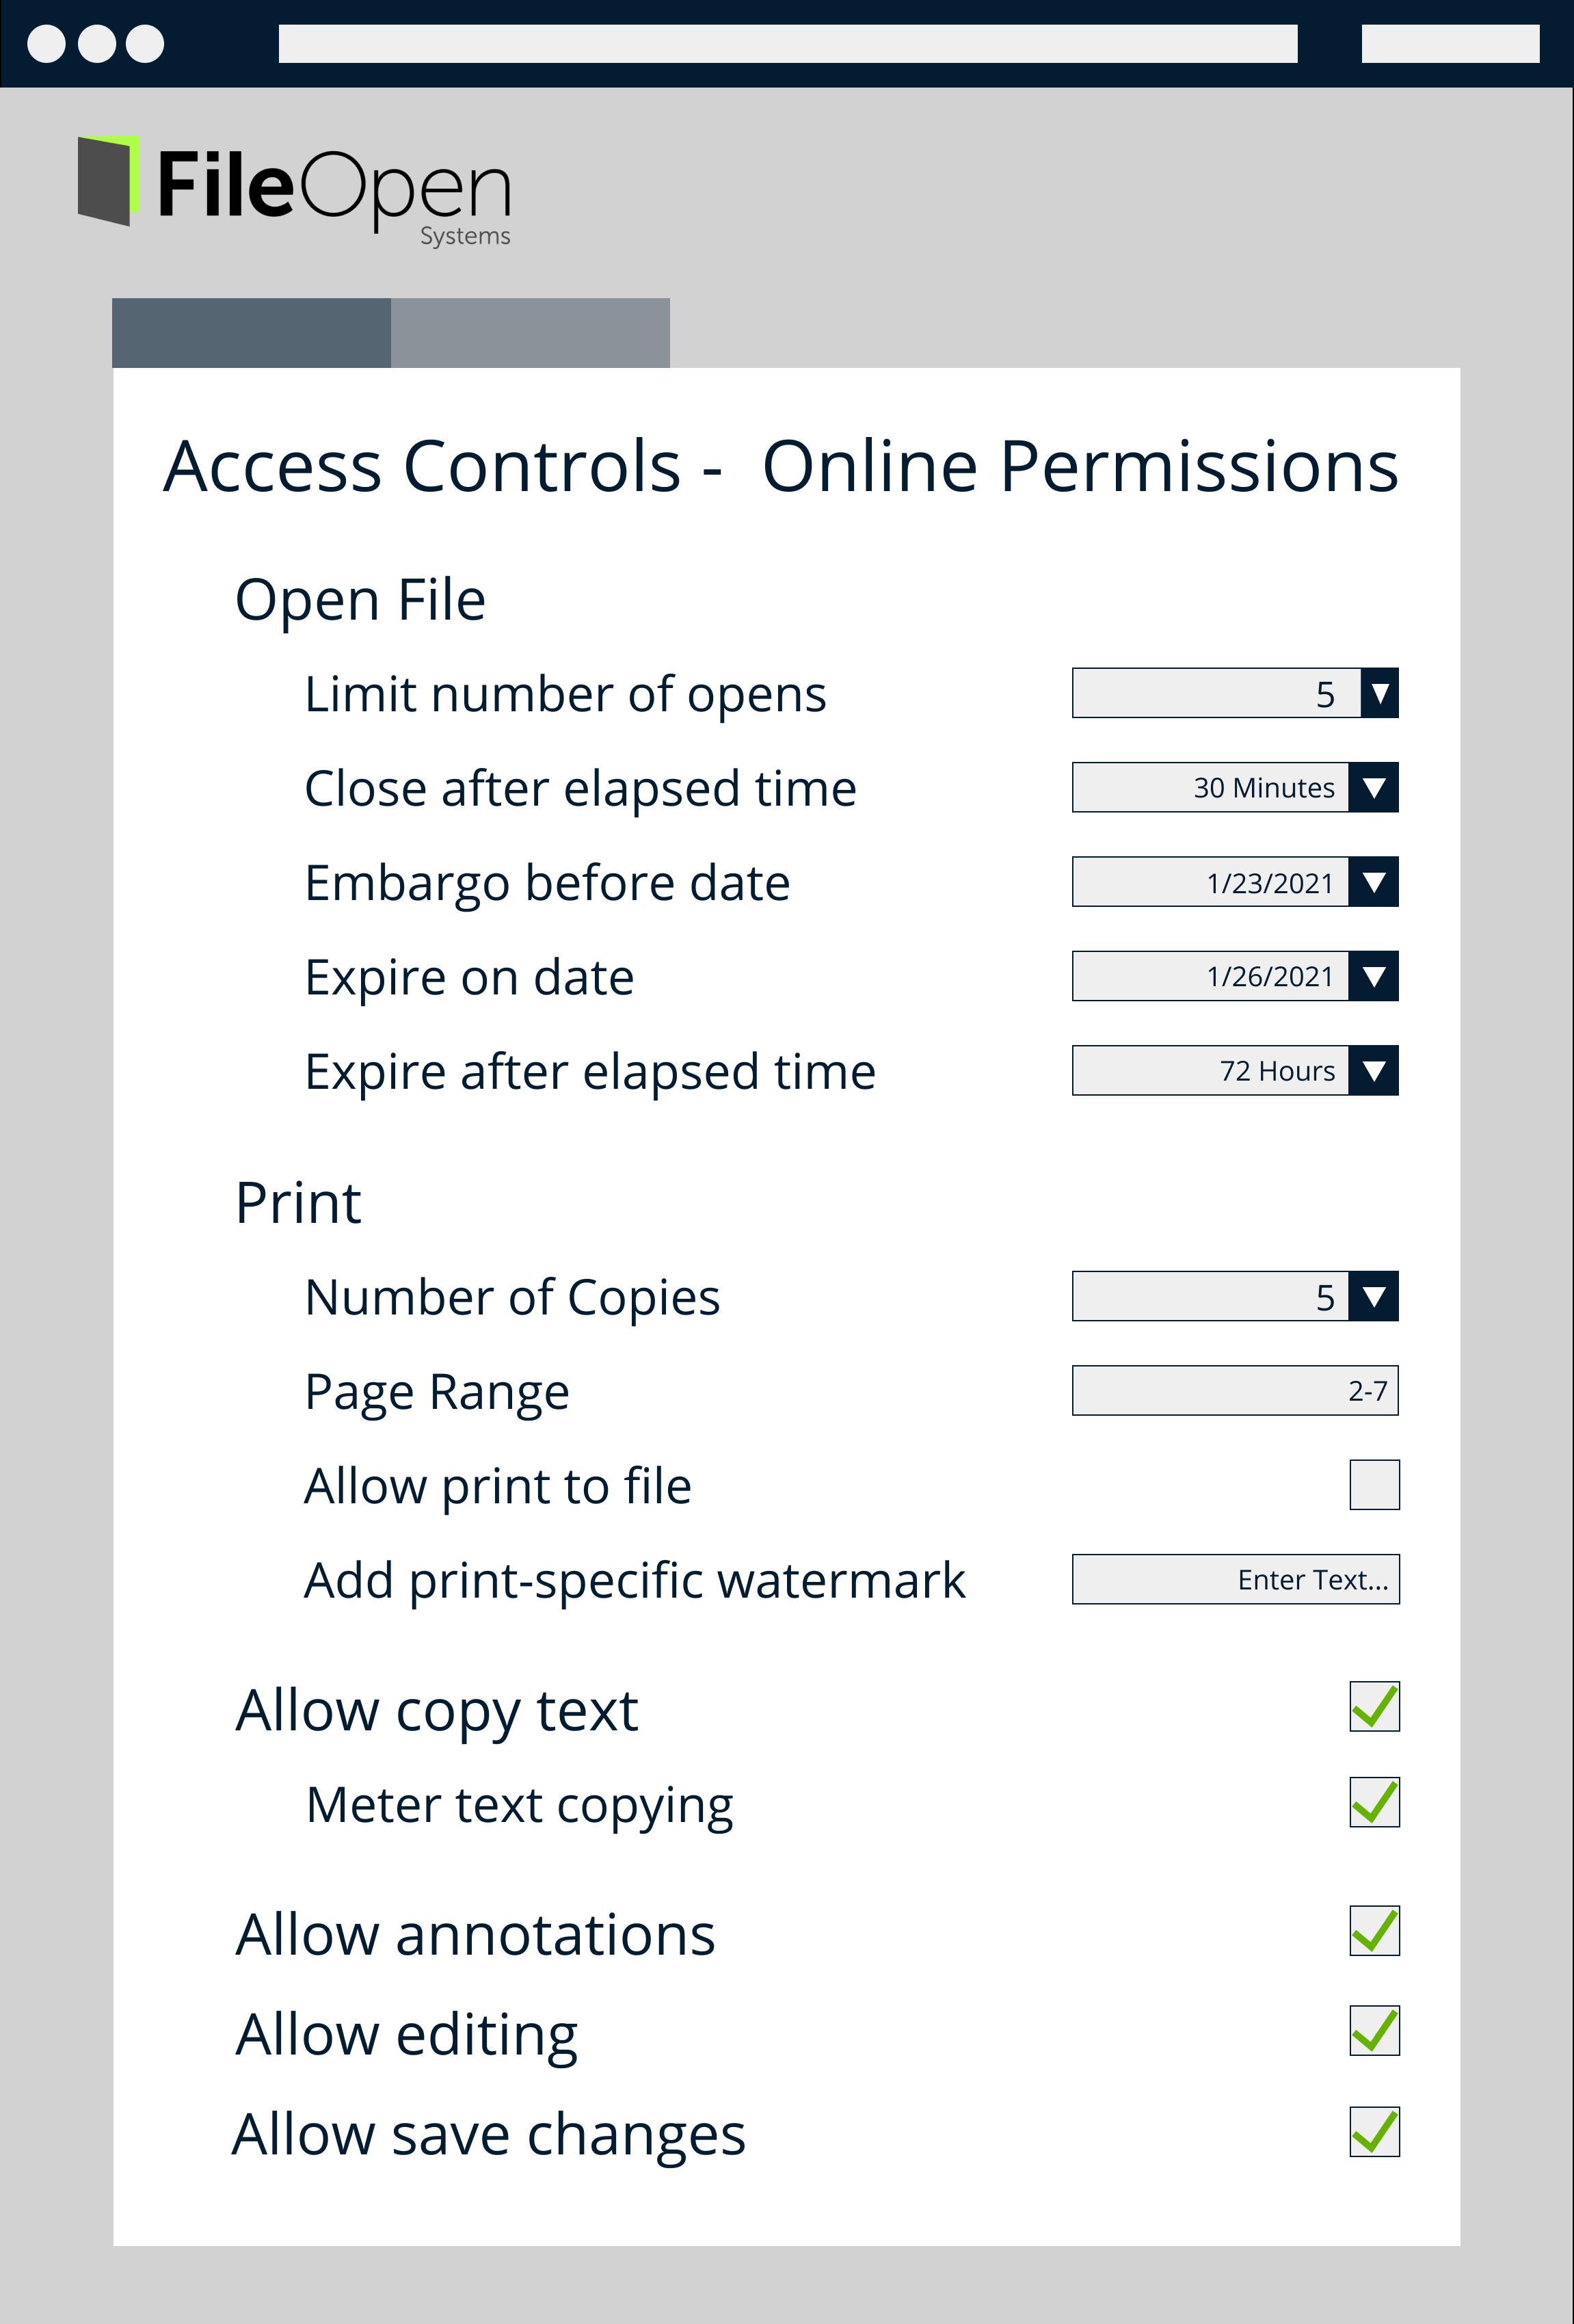 Access Controls - Online-1